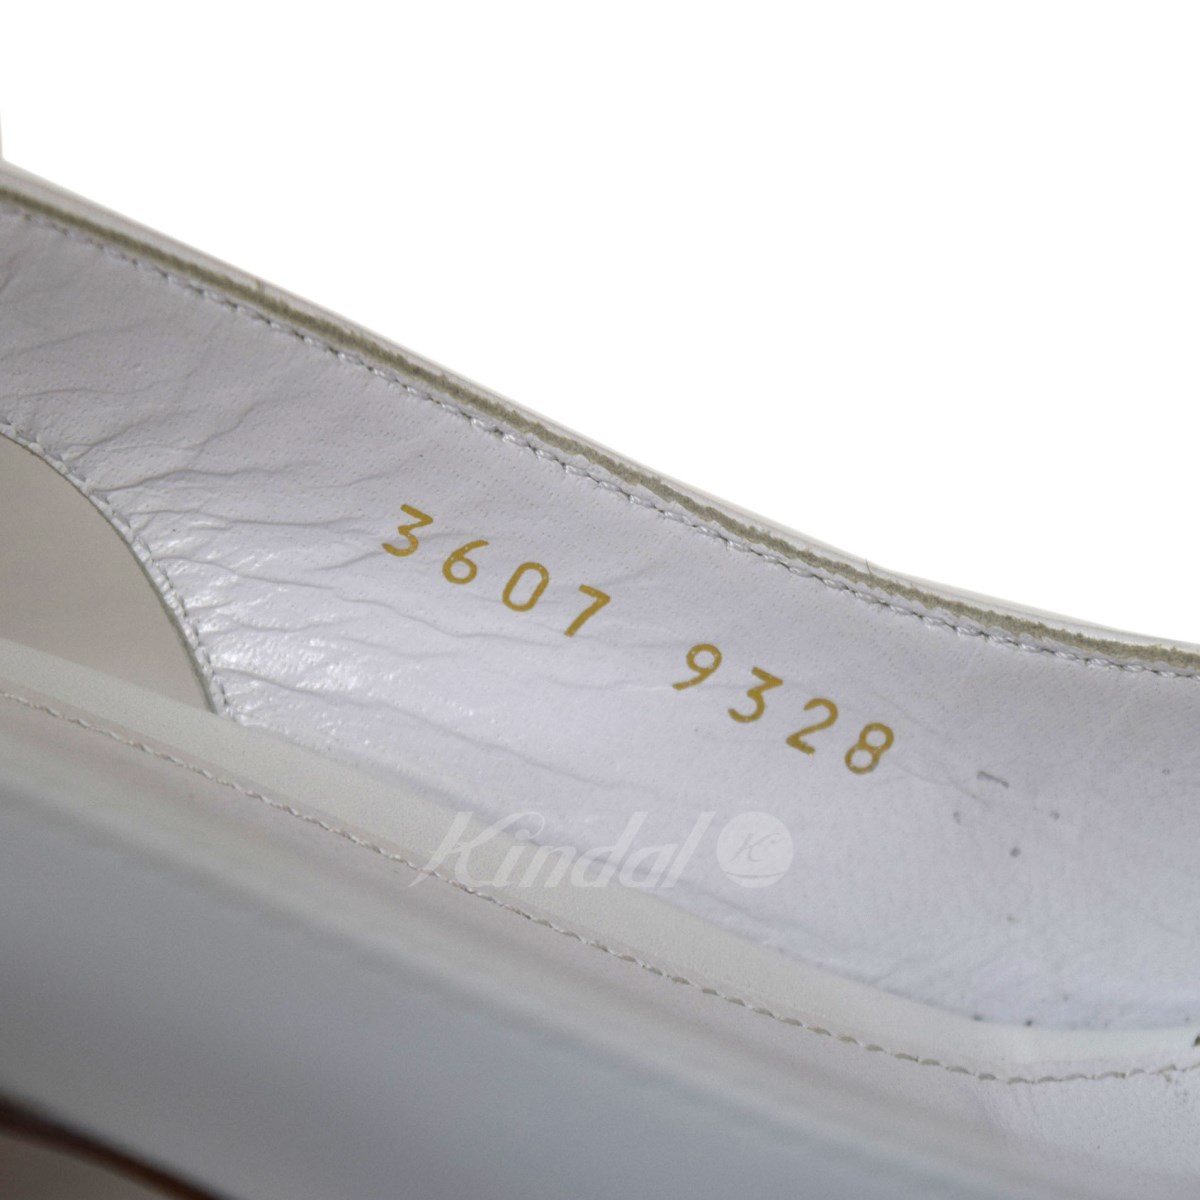 Gianvito Rossiオープントゥストラップサンダル ホワイト サイズ 36 1 2E2bDIeWH9Y